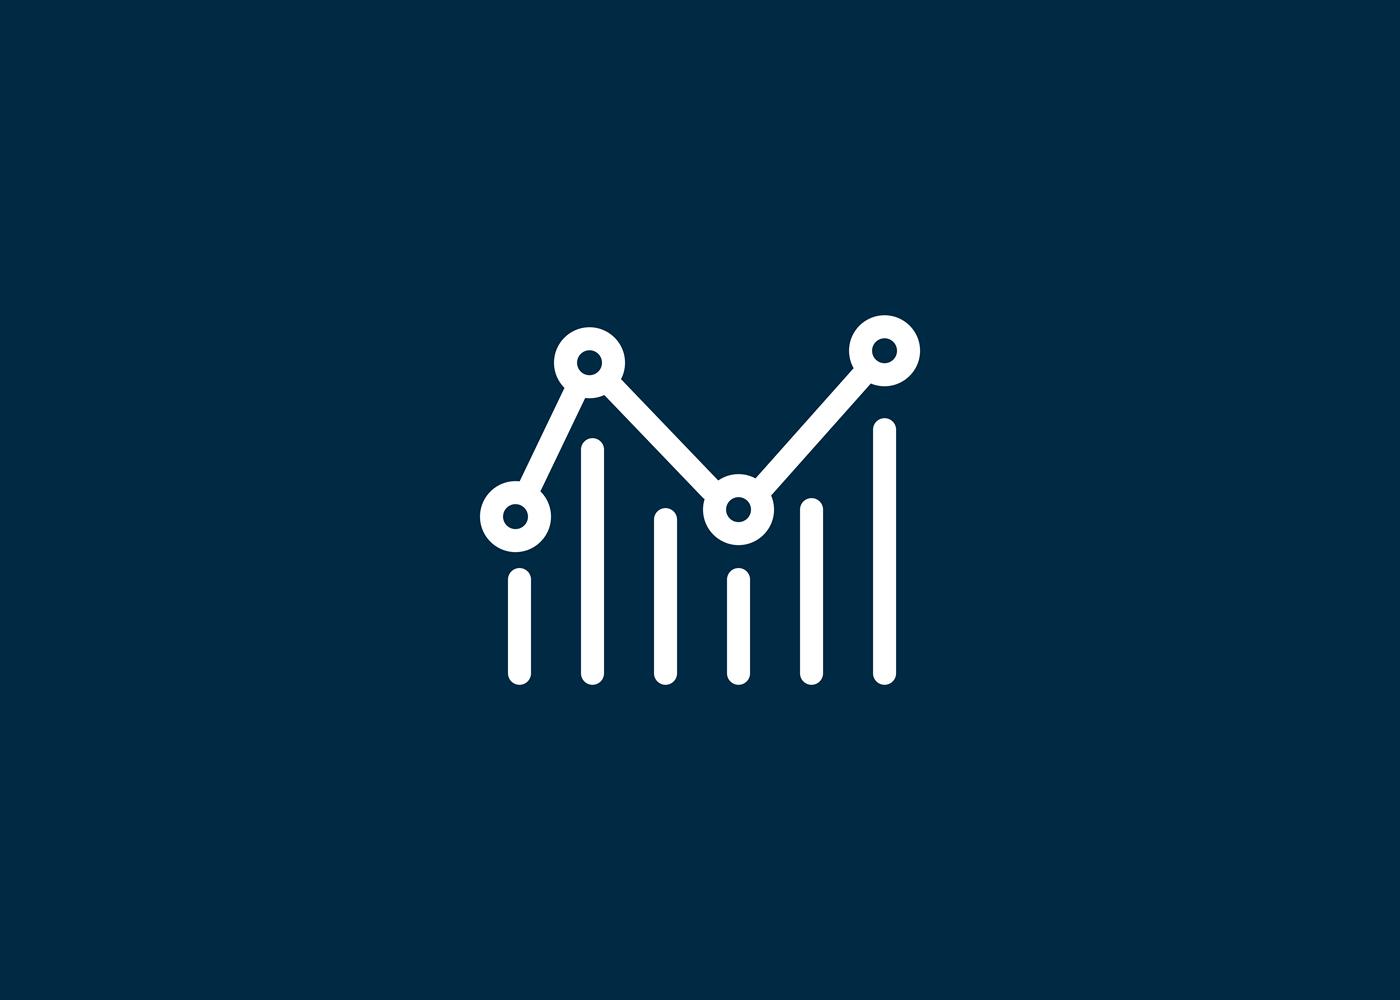 naem-research-quickpolls-2018-05-safety-statistics-700x500